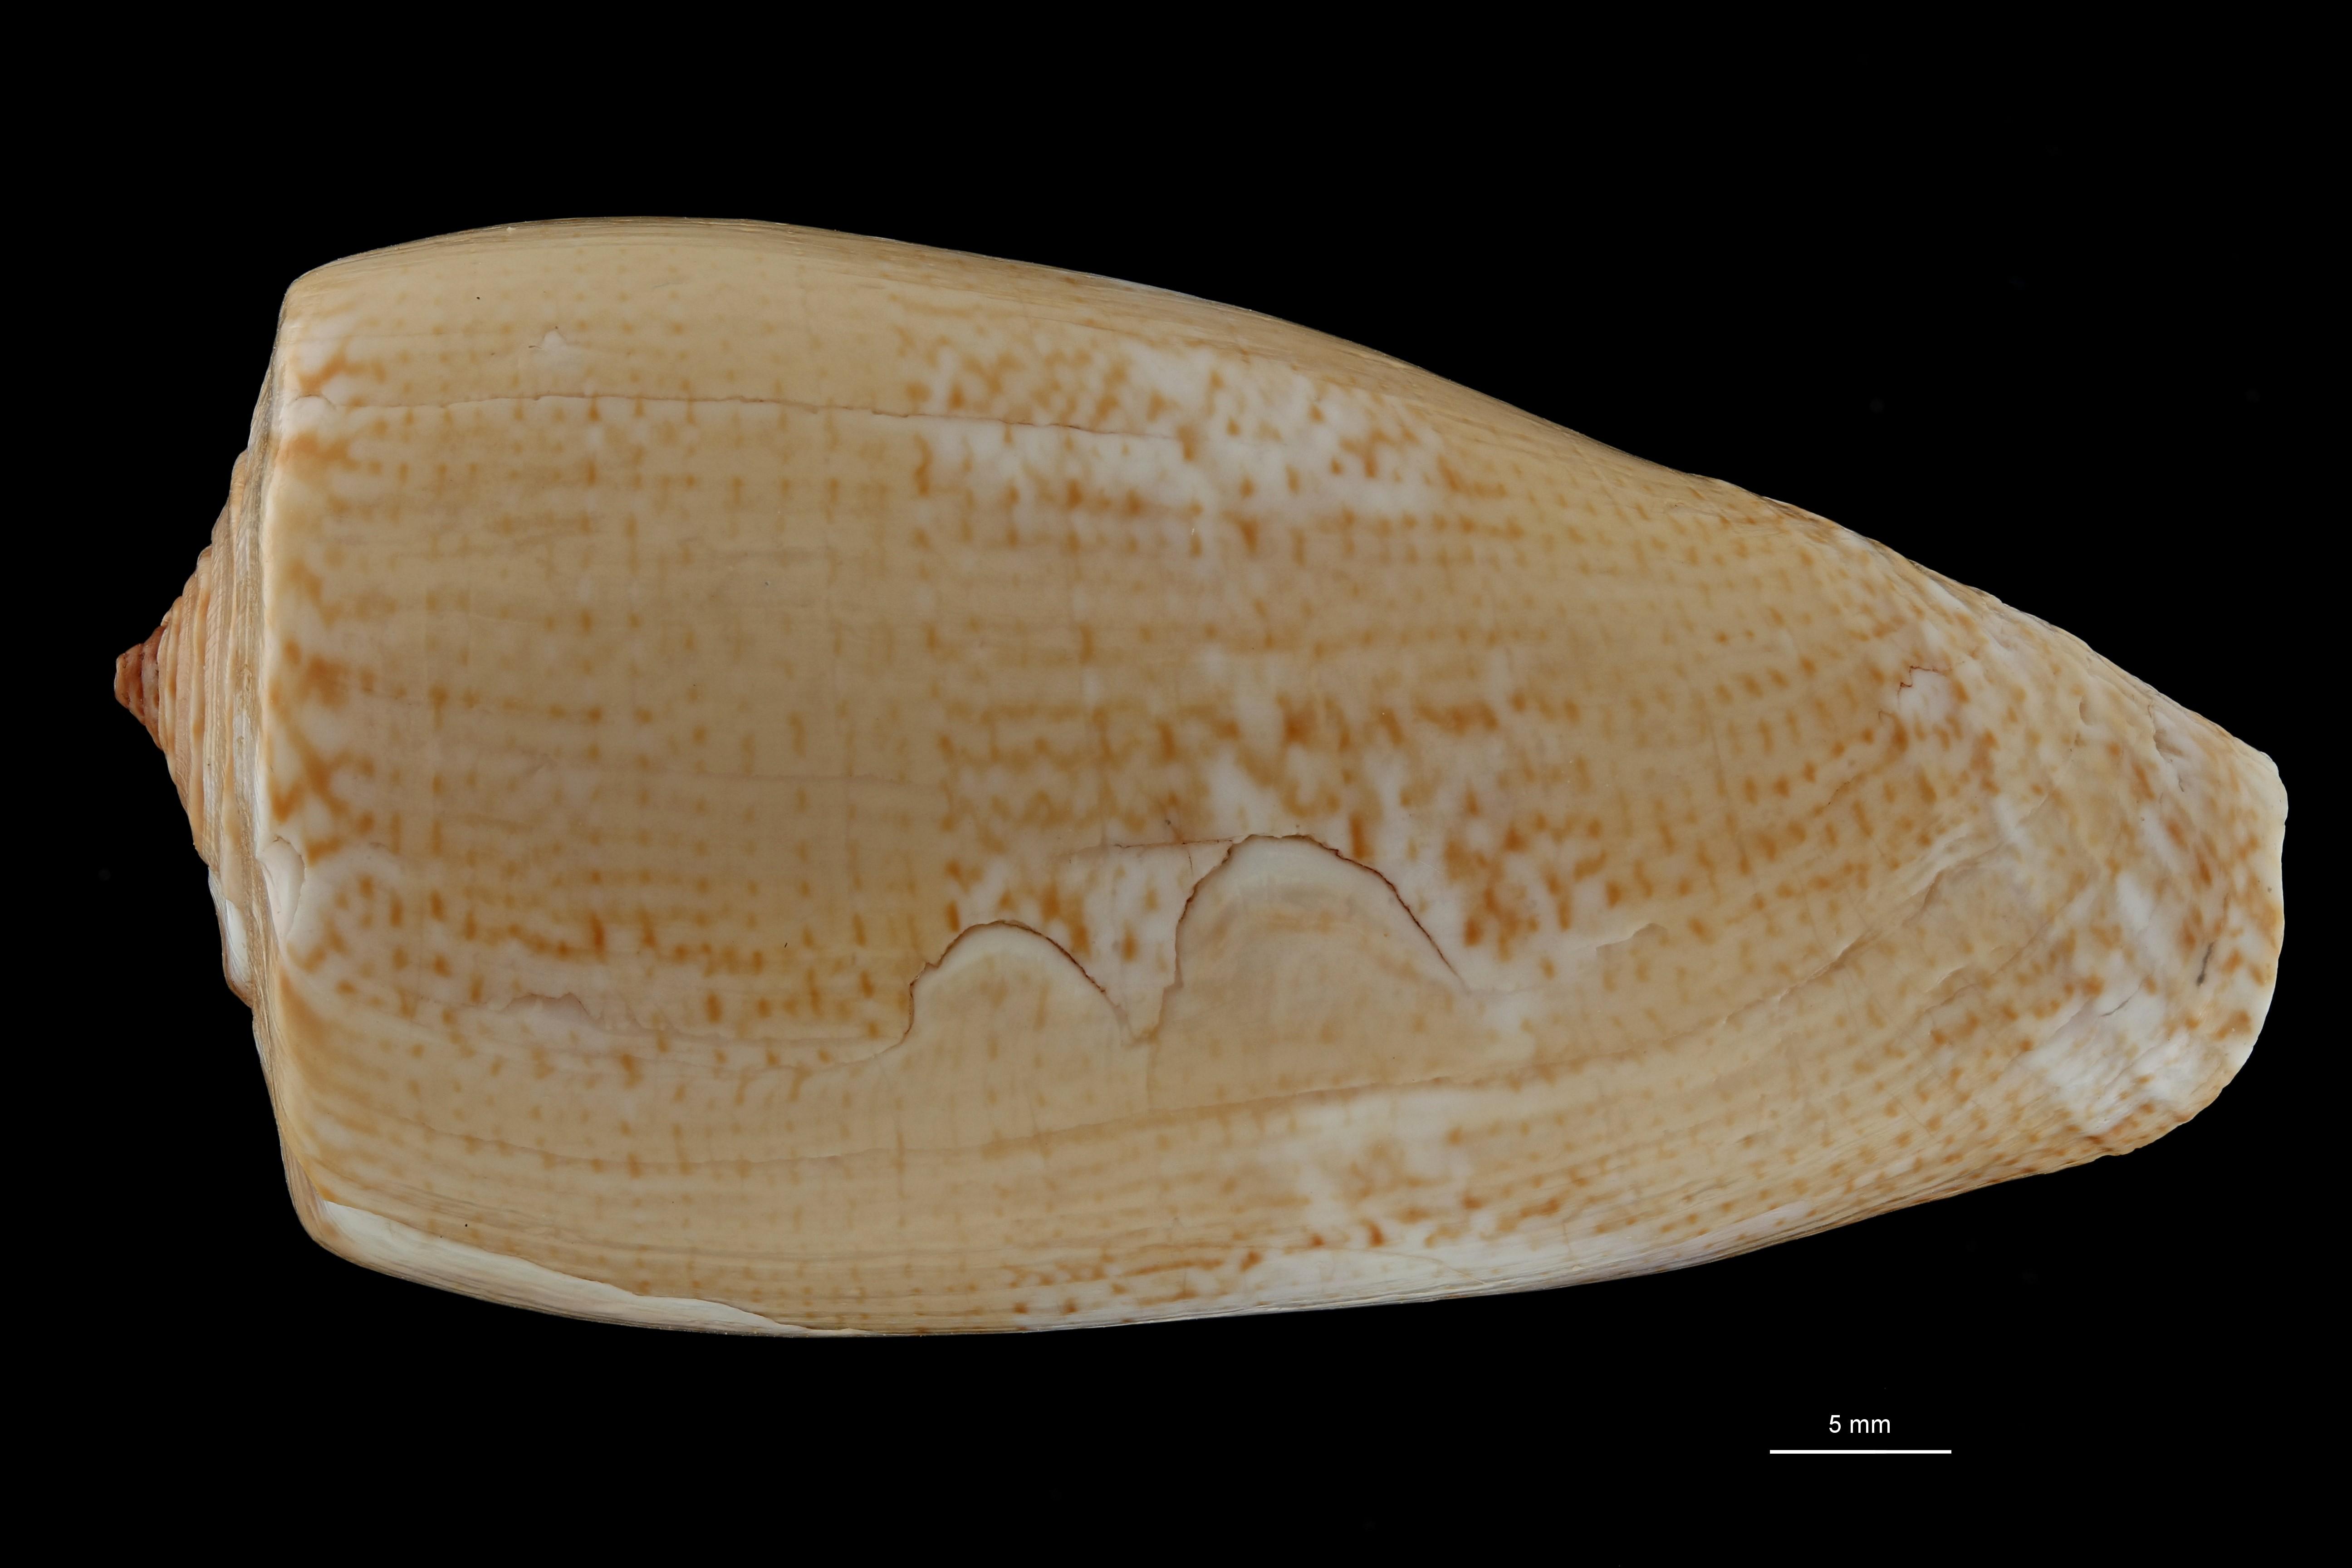 BE-RBINS-INV MT 390 Conus (Gastridium) cuvieri Ht D ZS PMax Scaled.jpg